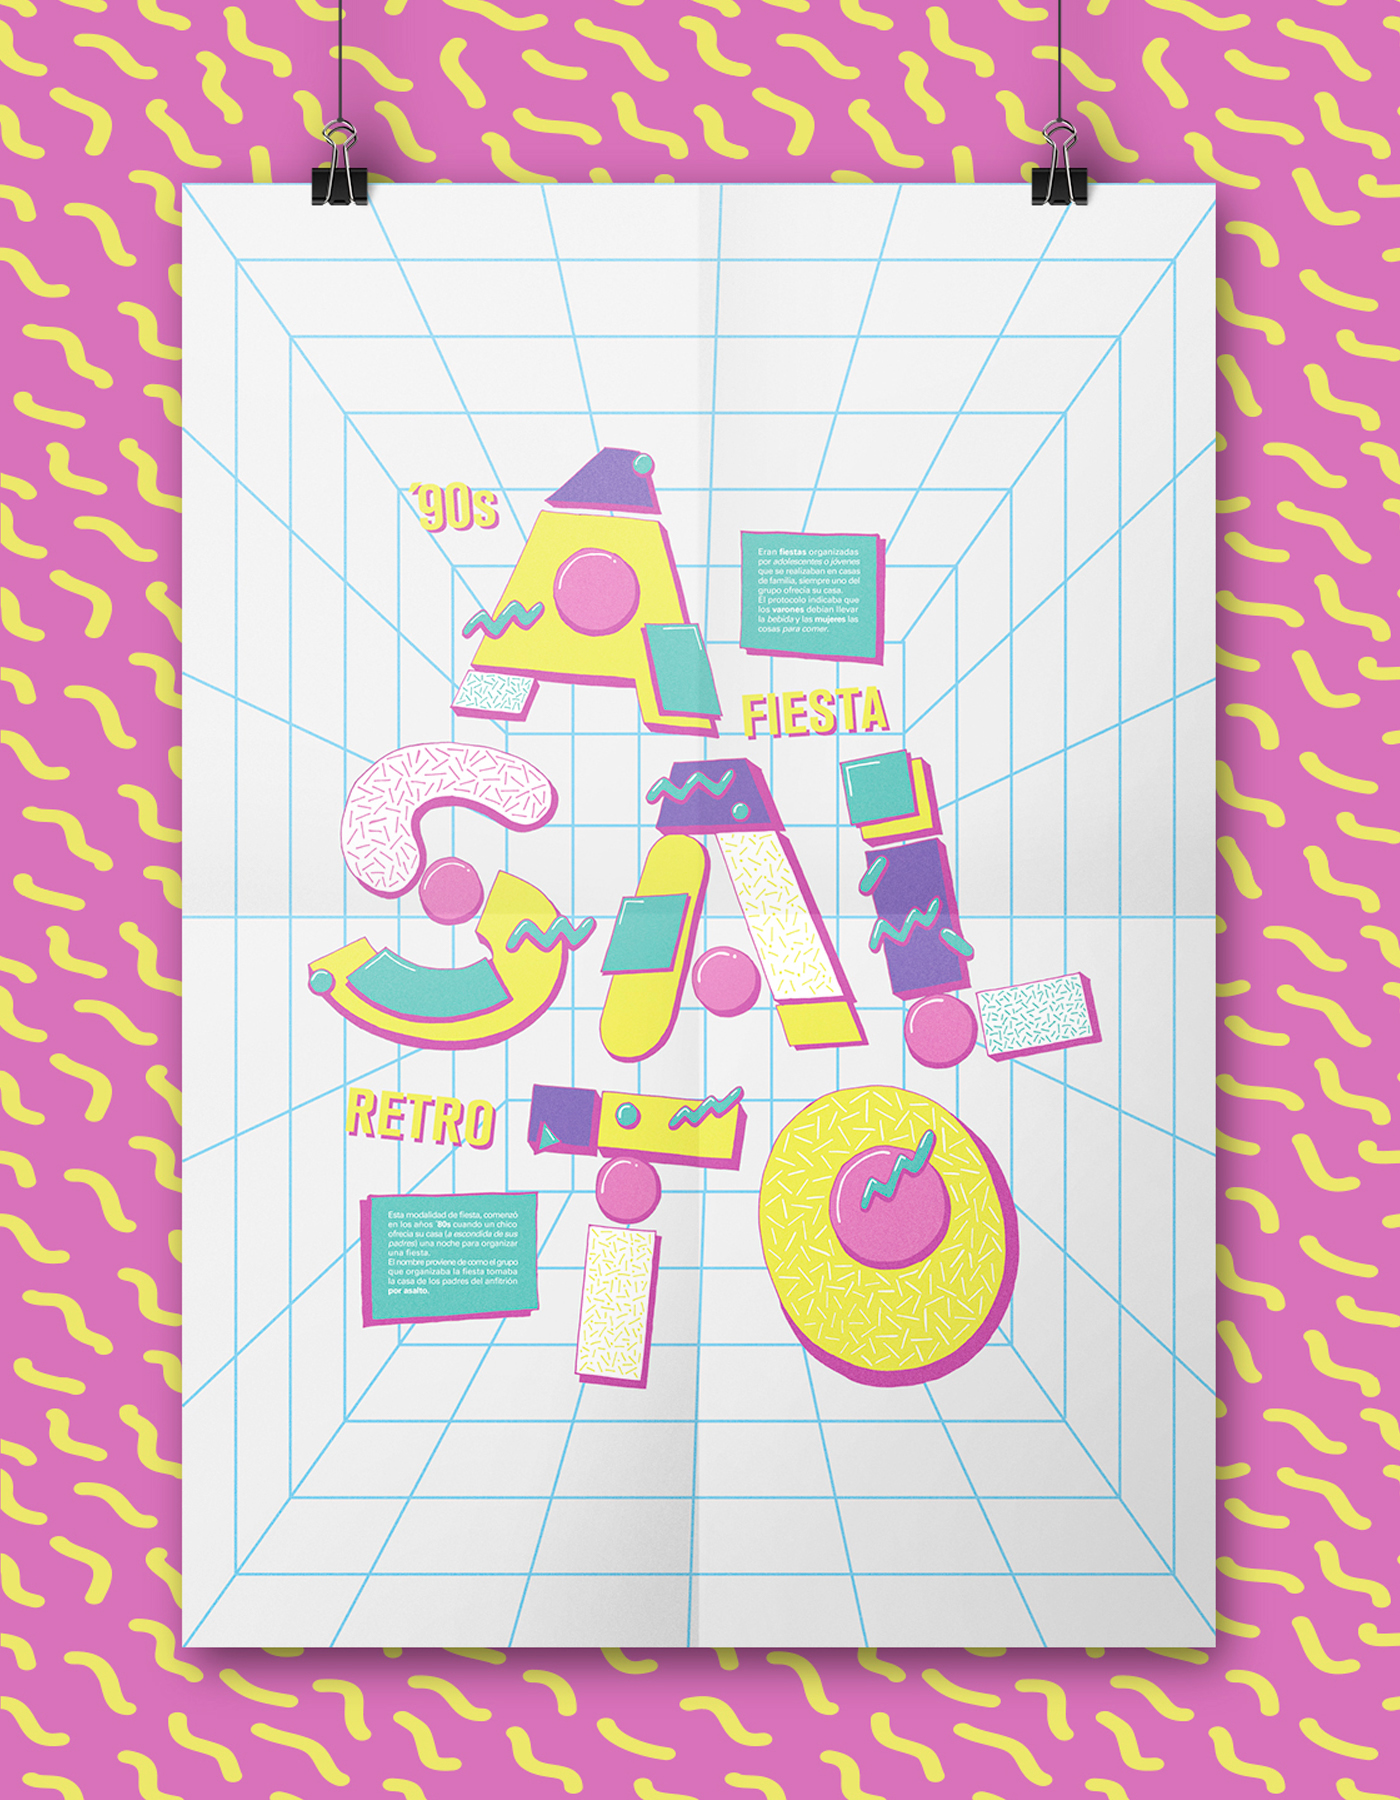 90s 80s Memphis fiesta tipografia poster cosgaya